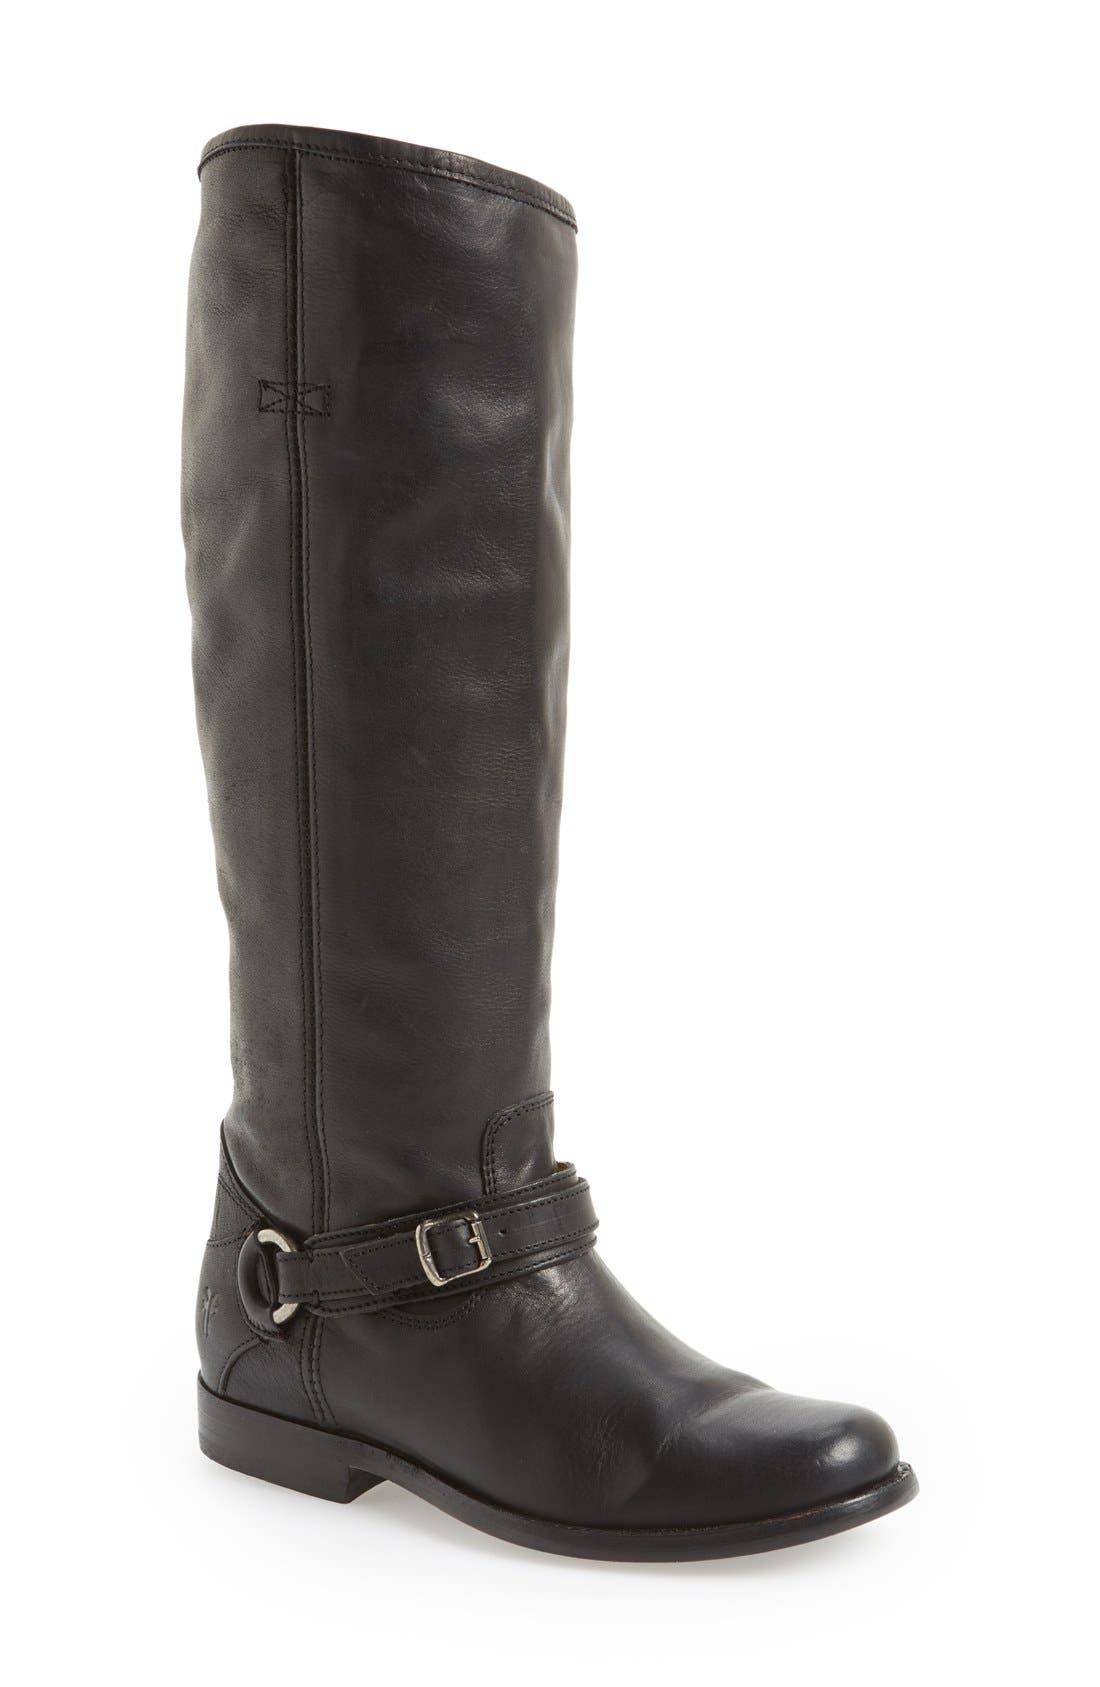 Alternate Image 1 Selected - Frye 'Phillip' Tall Boot (Women)